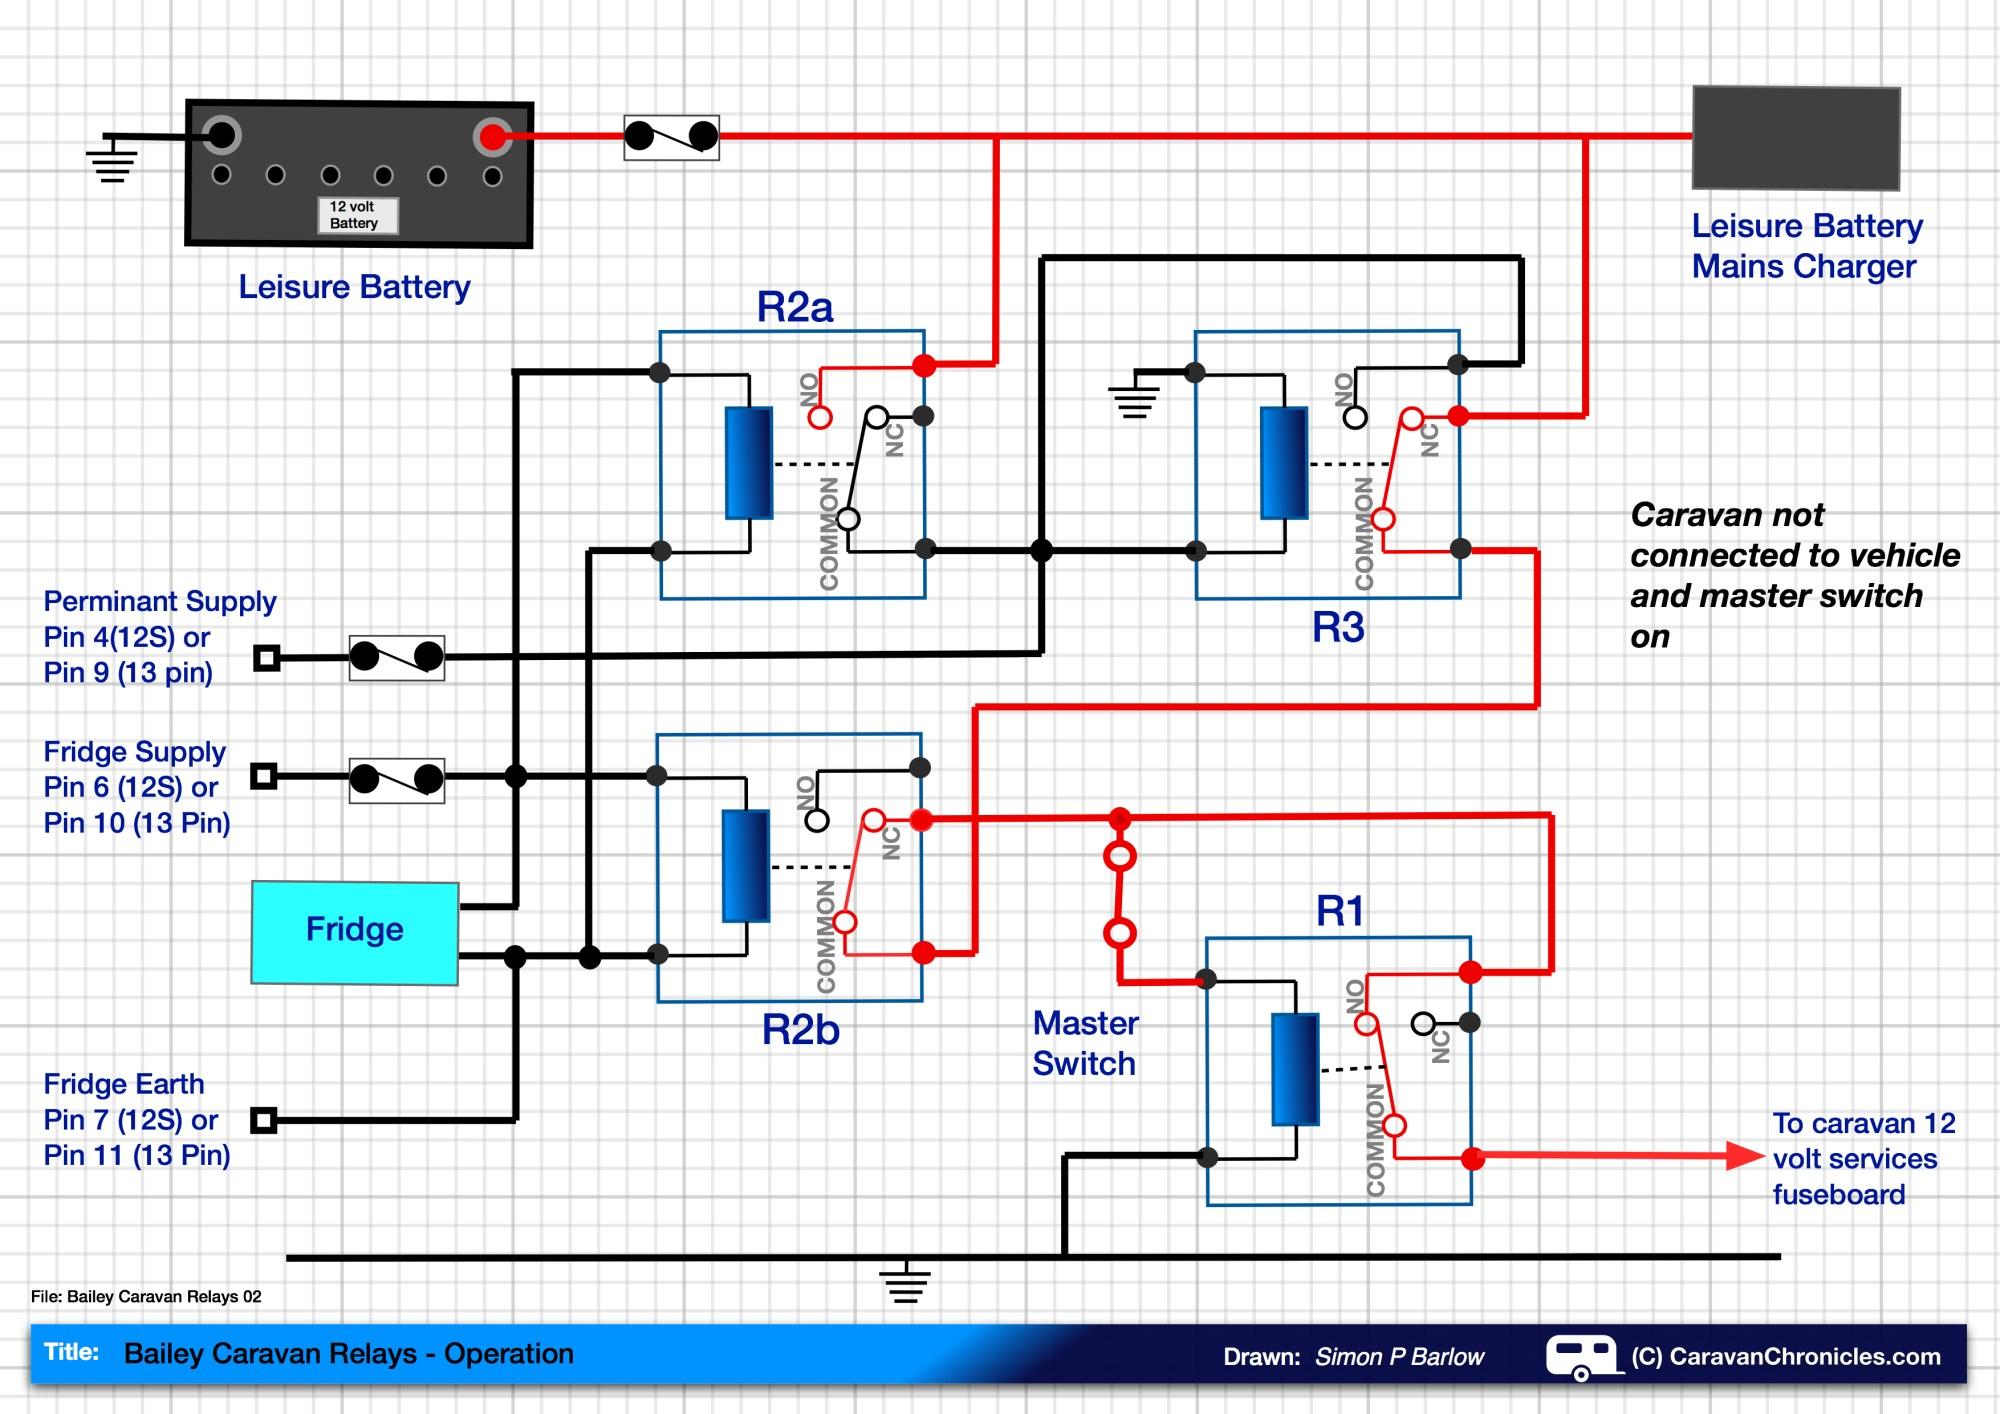 hight resolution of bailey caravan wiring diagram wiring diagrams konsulta readers puzzle answered caravan chronicles bailey caravan wiring diagram